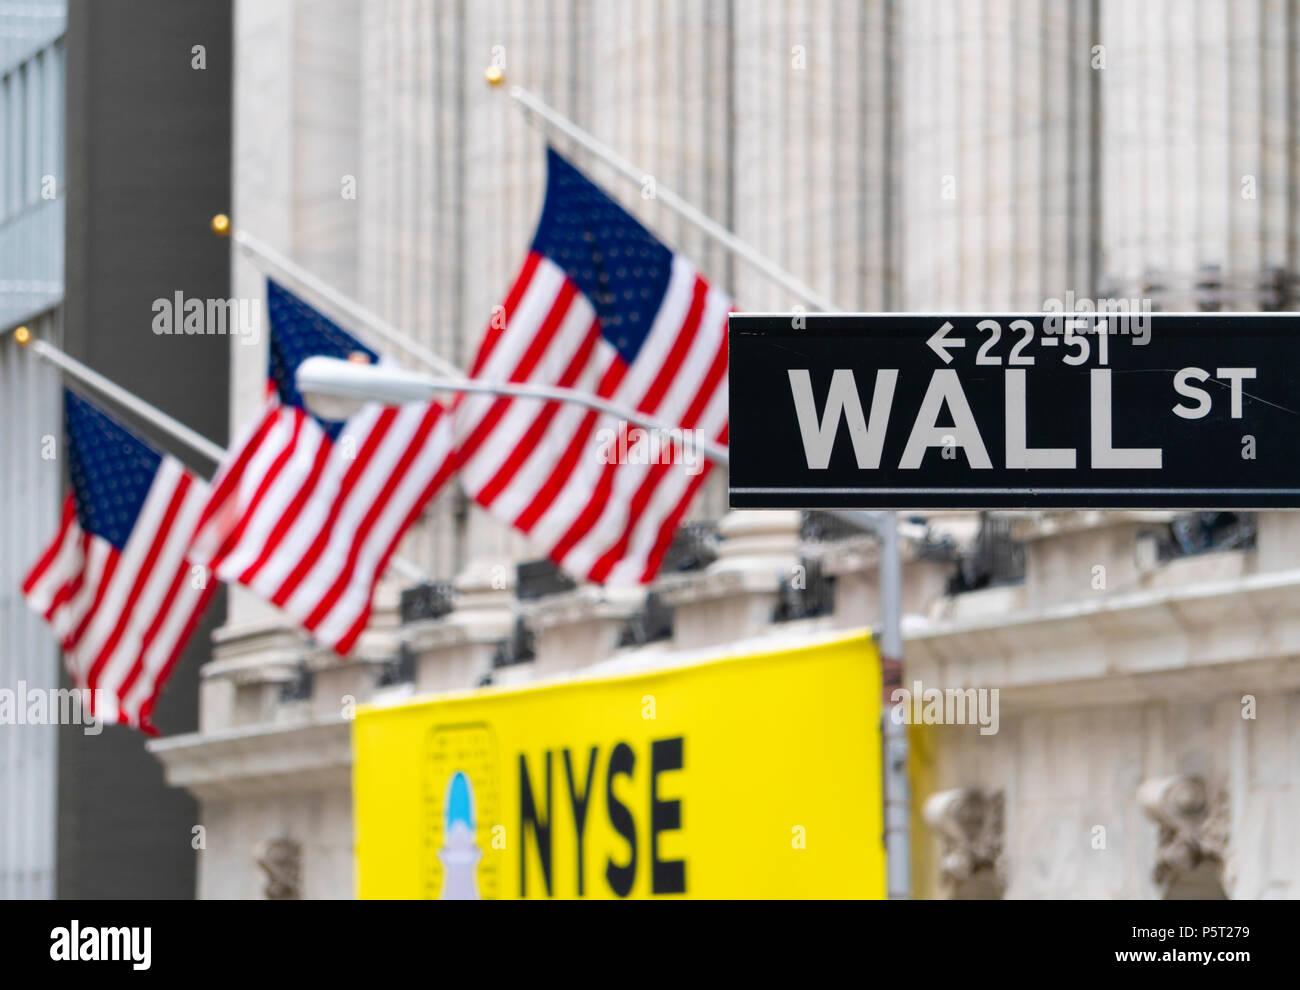 Wall Street sign near New York Stock Exchange - Stock Image